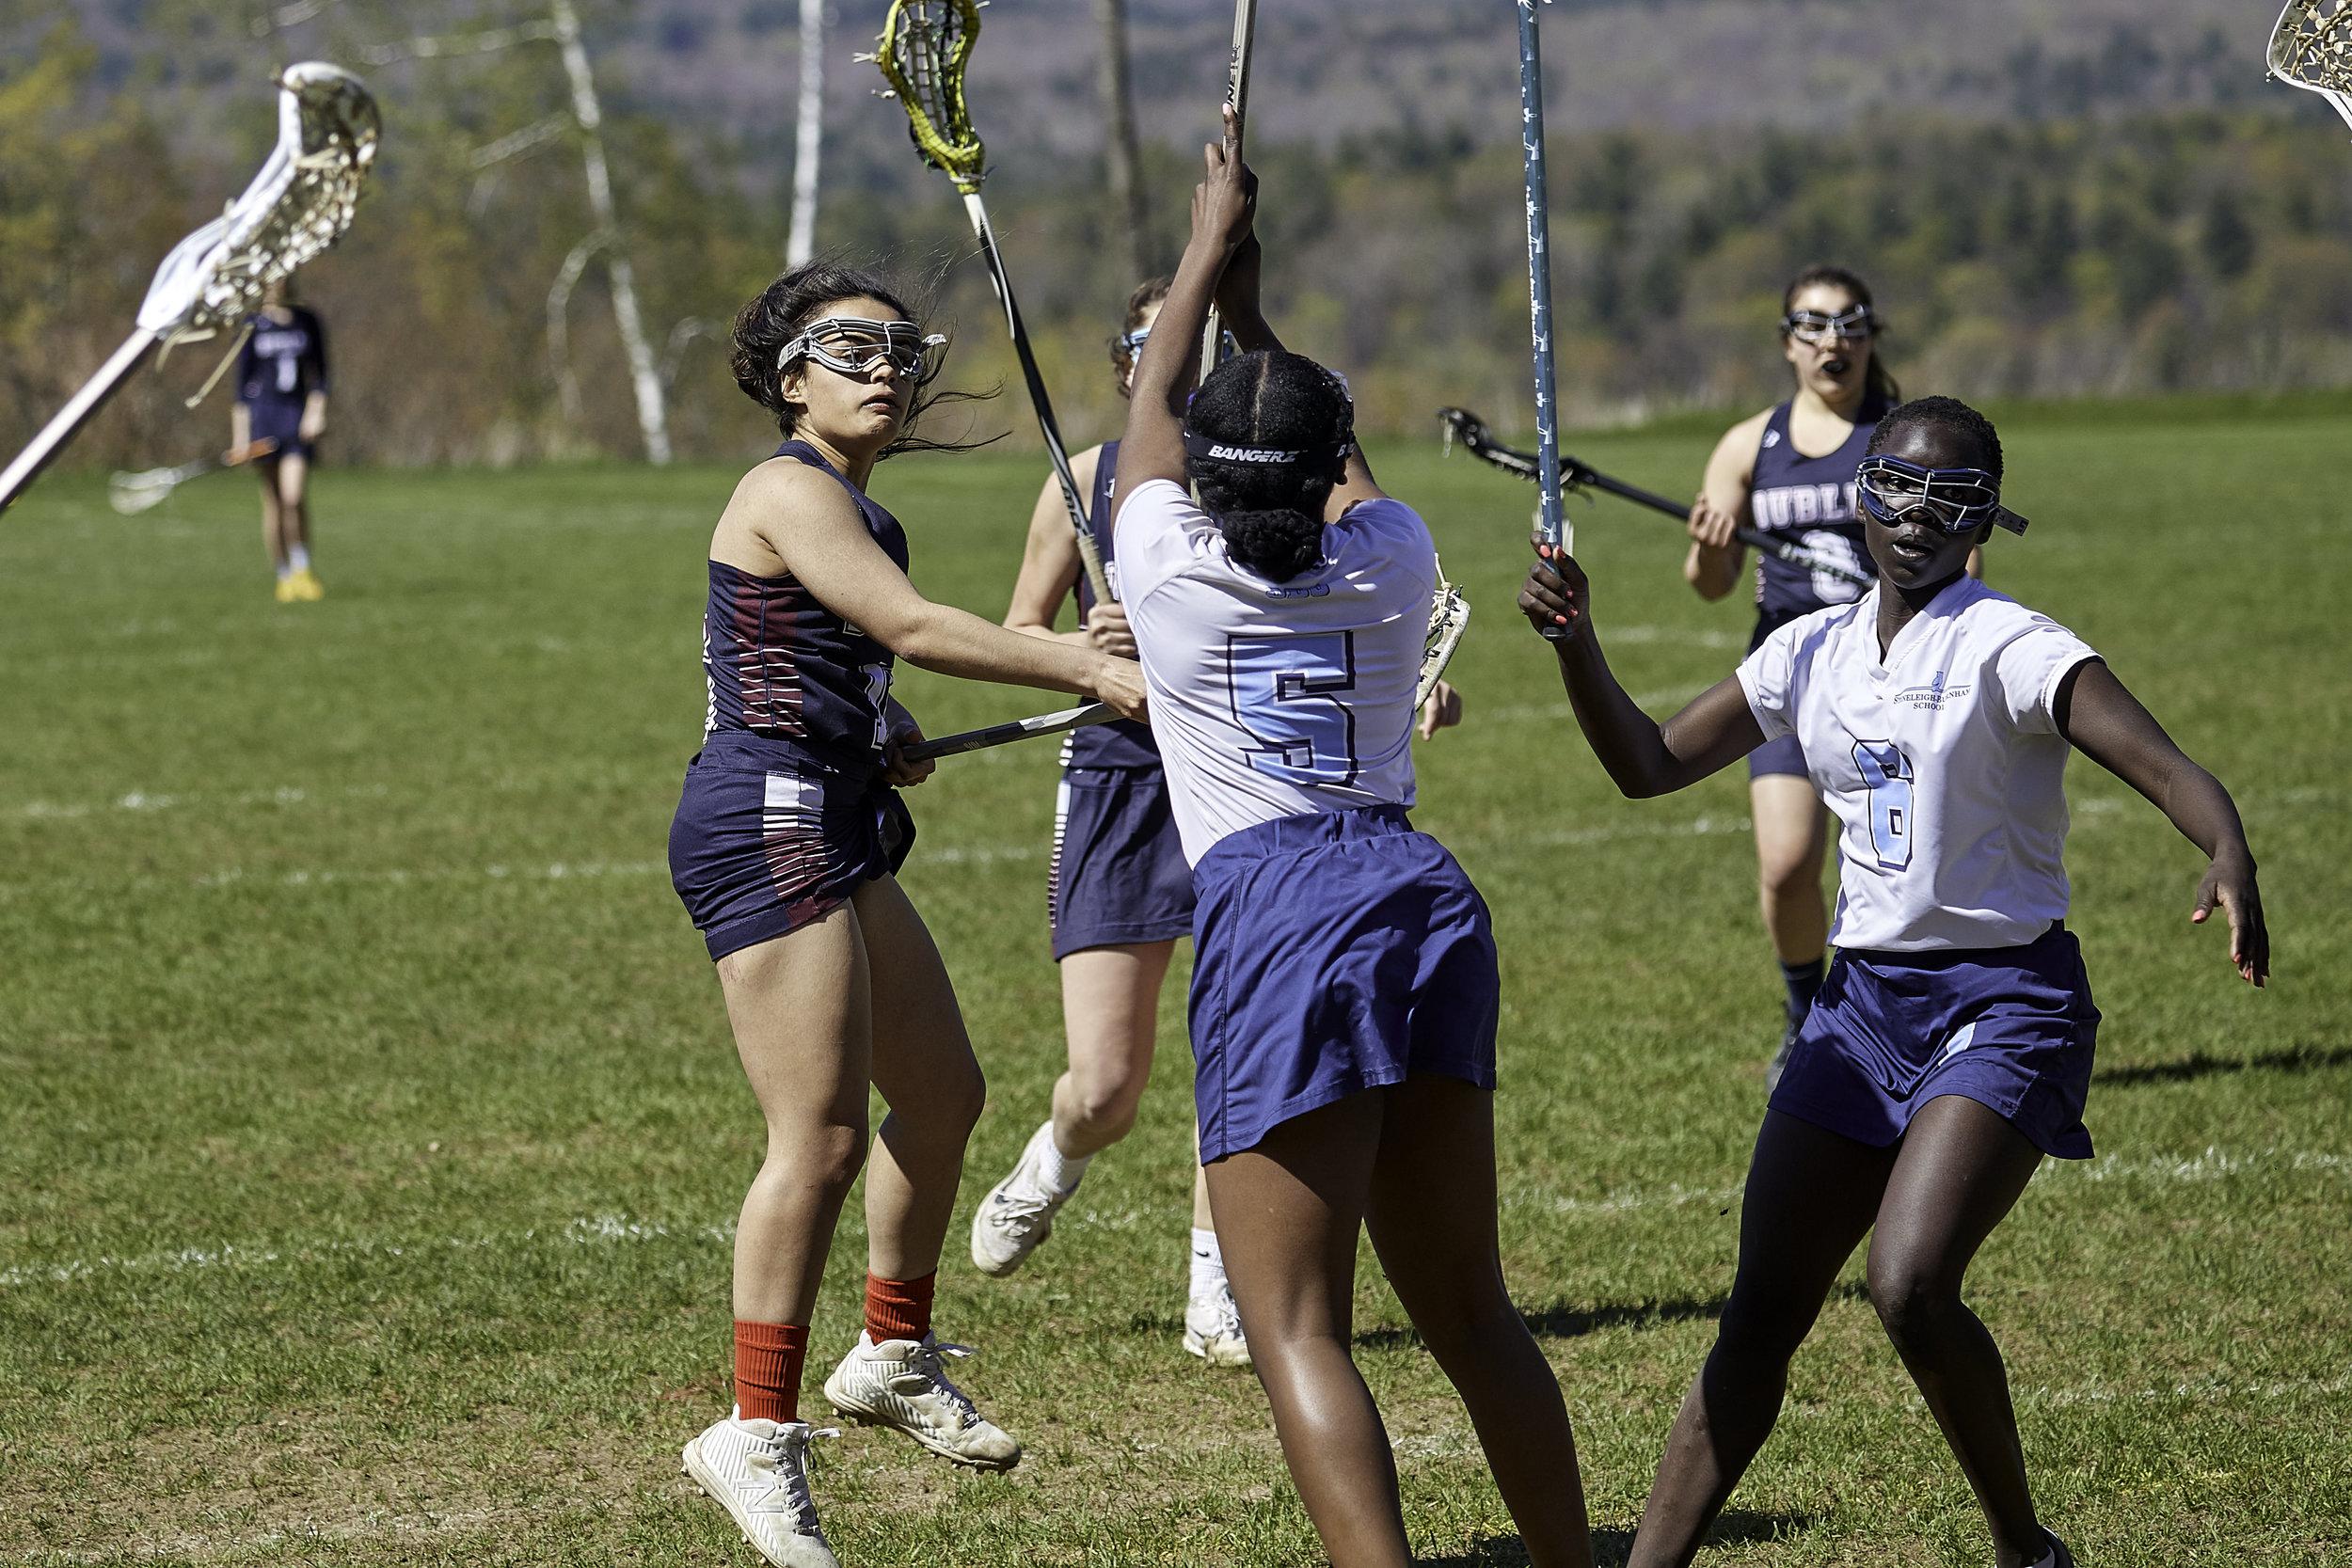 Girls Lacrosse vs. Stoneleigh Burnham School - May 11, 2019 - May 10, 2019193439.jpg